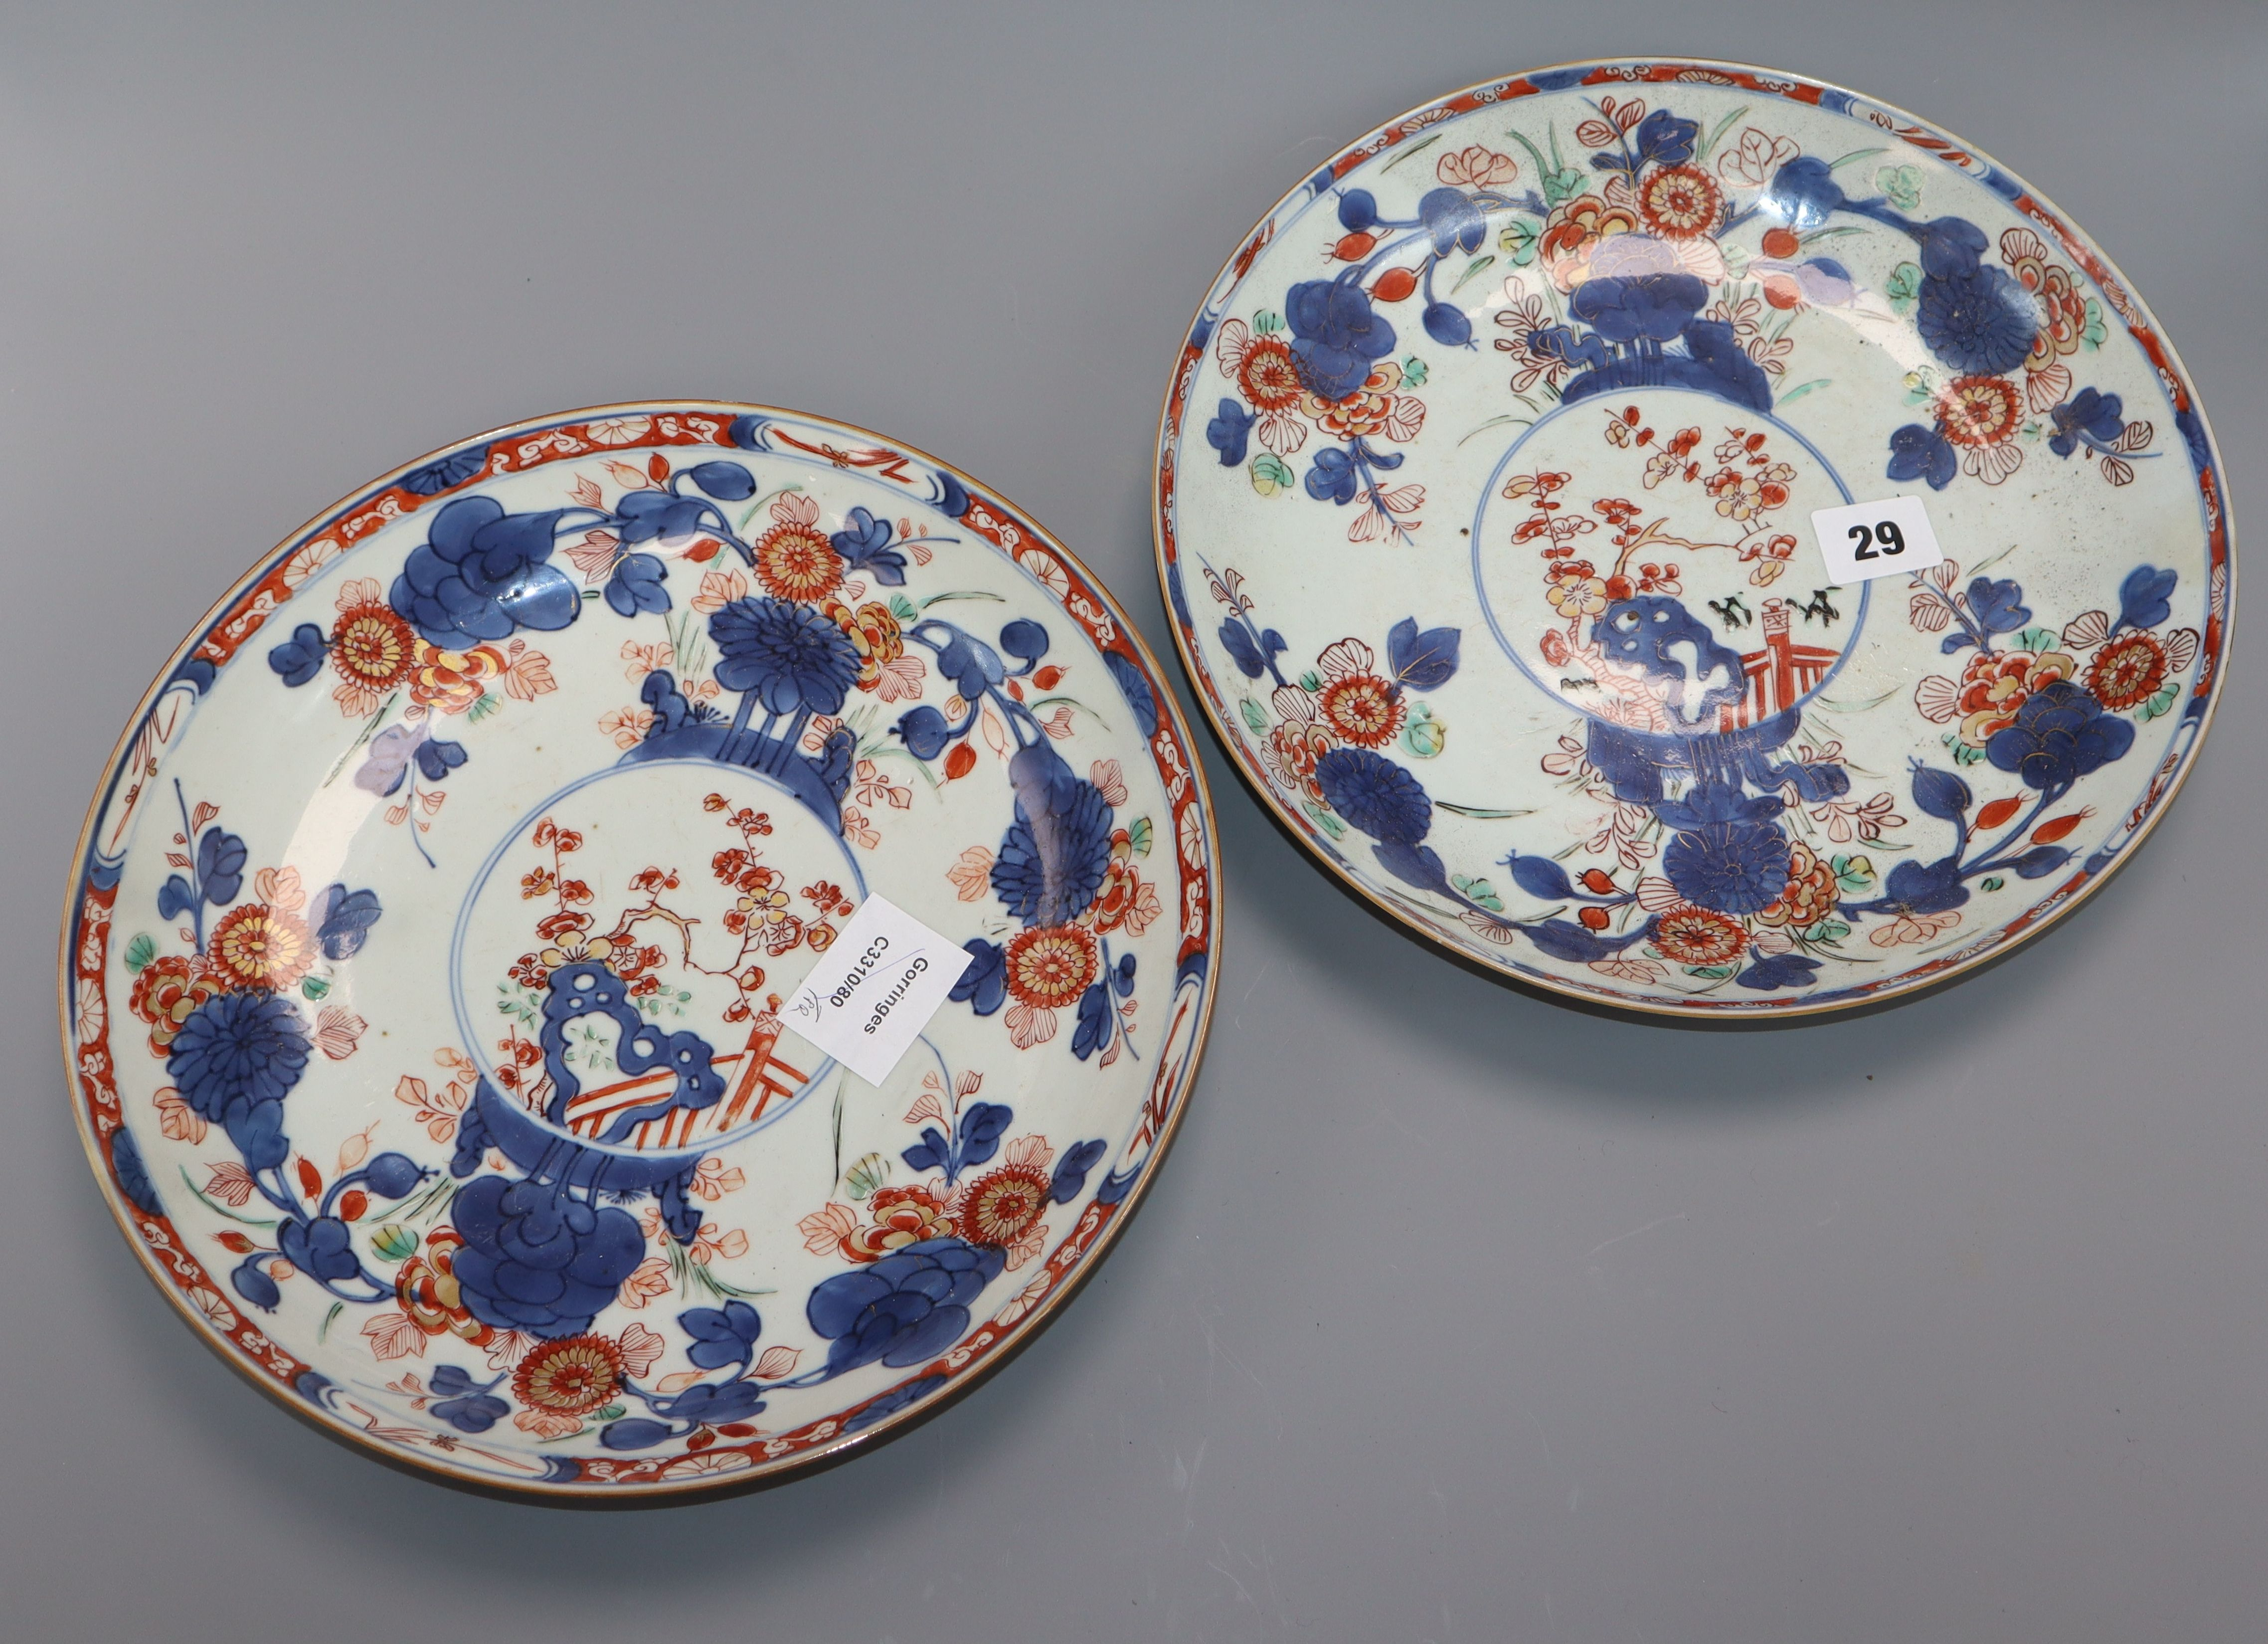 Lot 29 - A pair of 18th century Chinese Imari dishes diameter 28cm